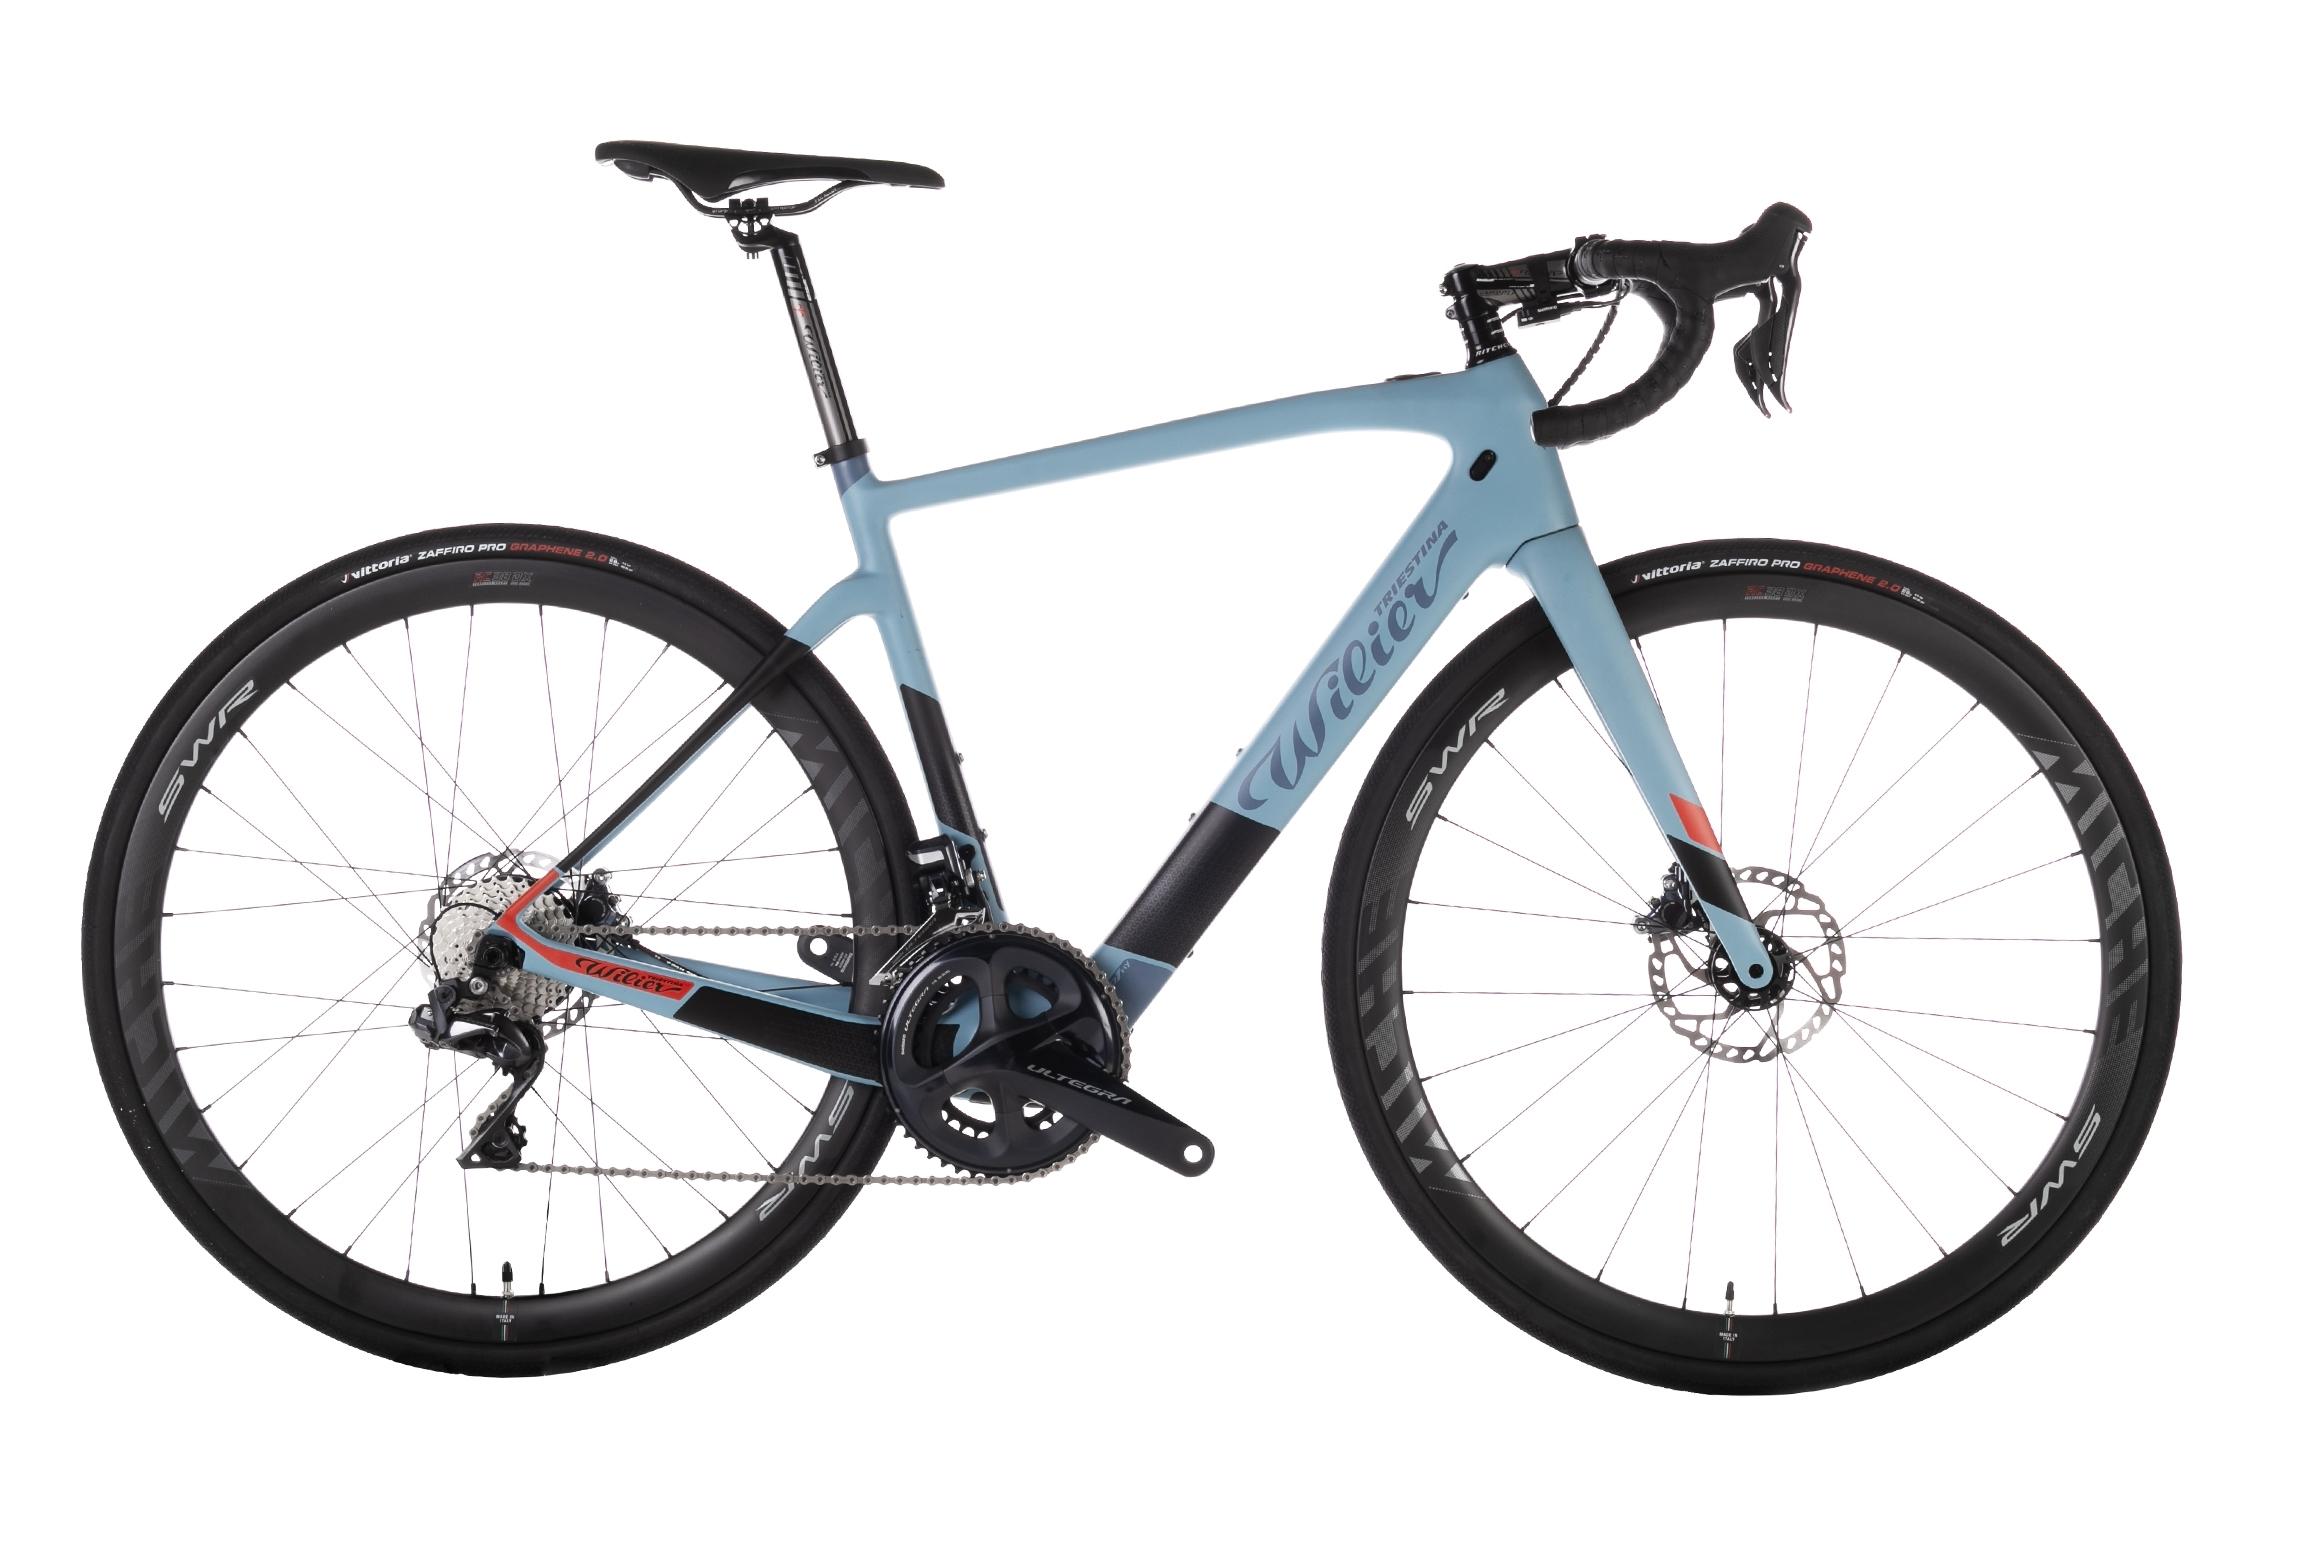 kolo CENTO1HY+ULTEGRA Di2 8070+REVOX blue black  L